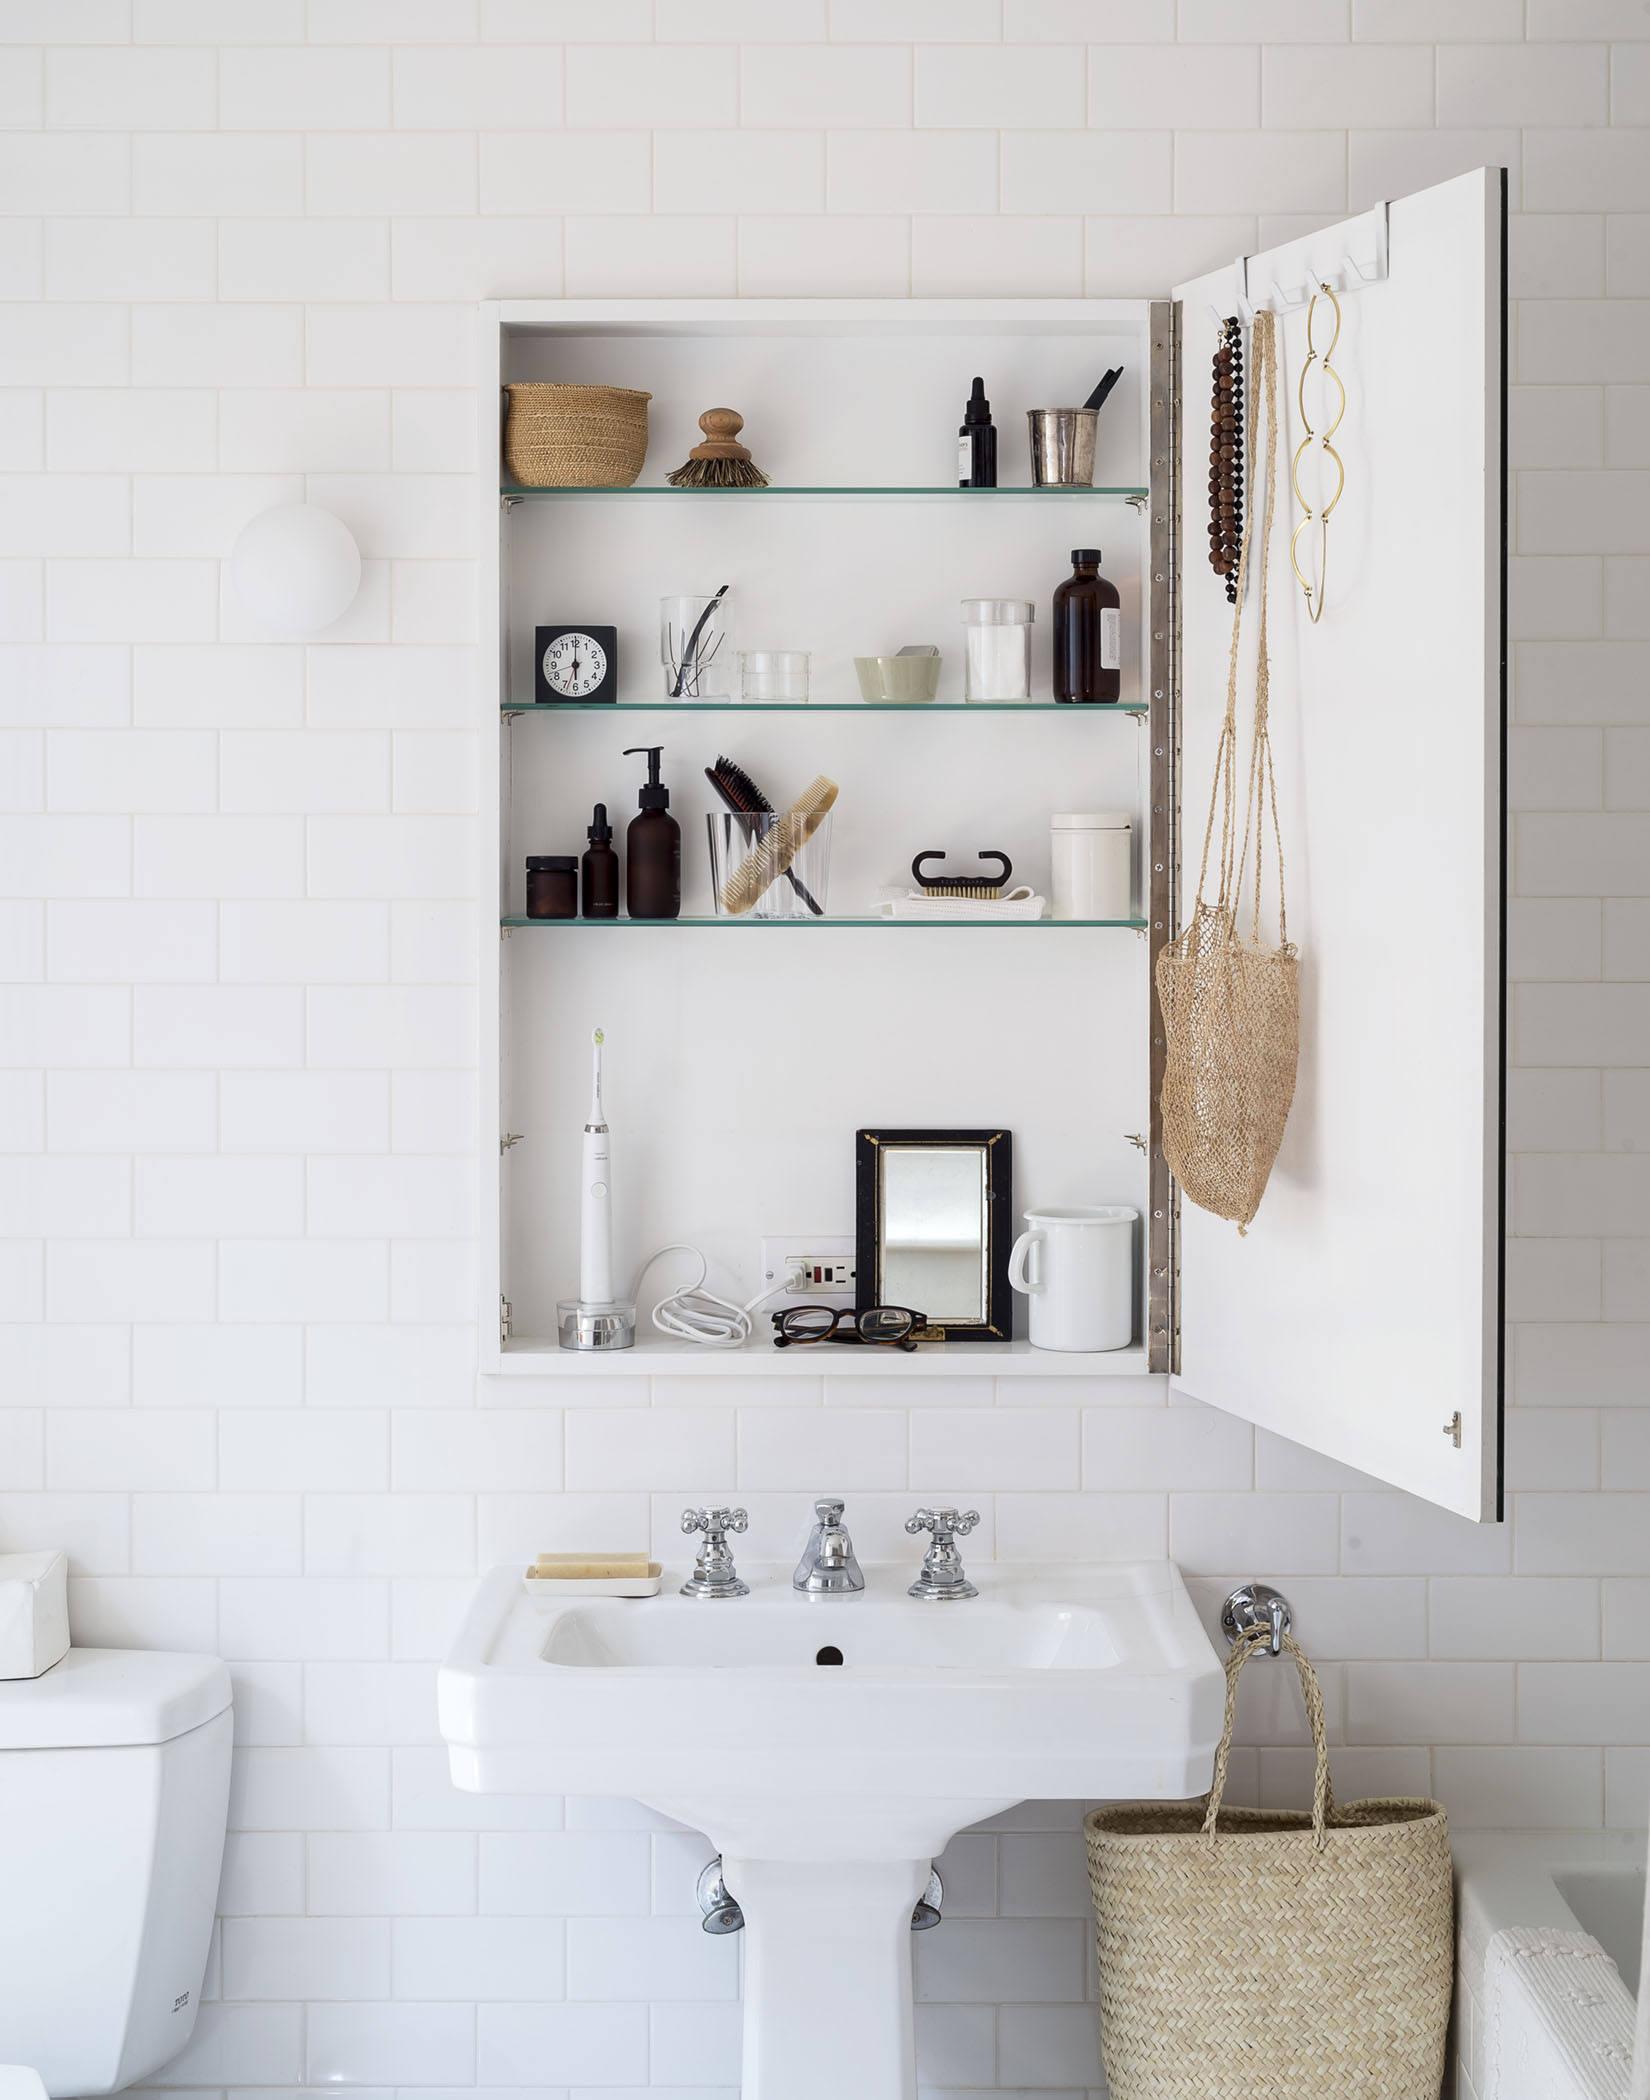 opbergruimte tips badkamer stopcontact in wandkast